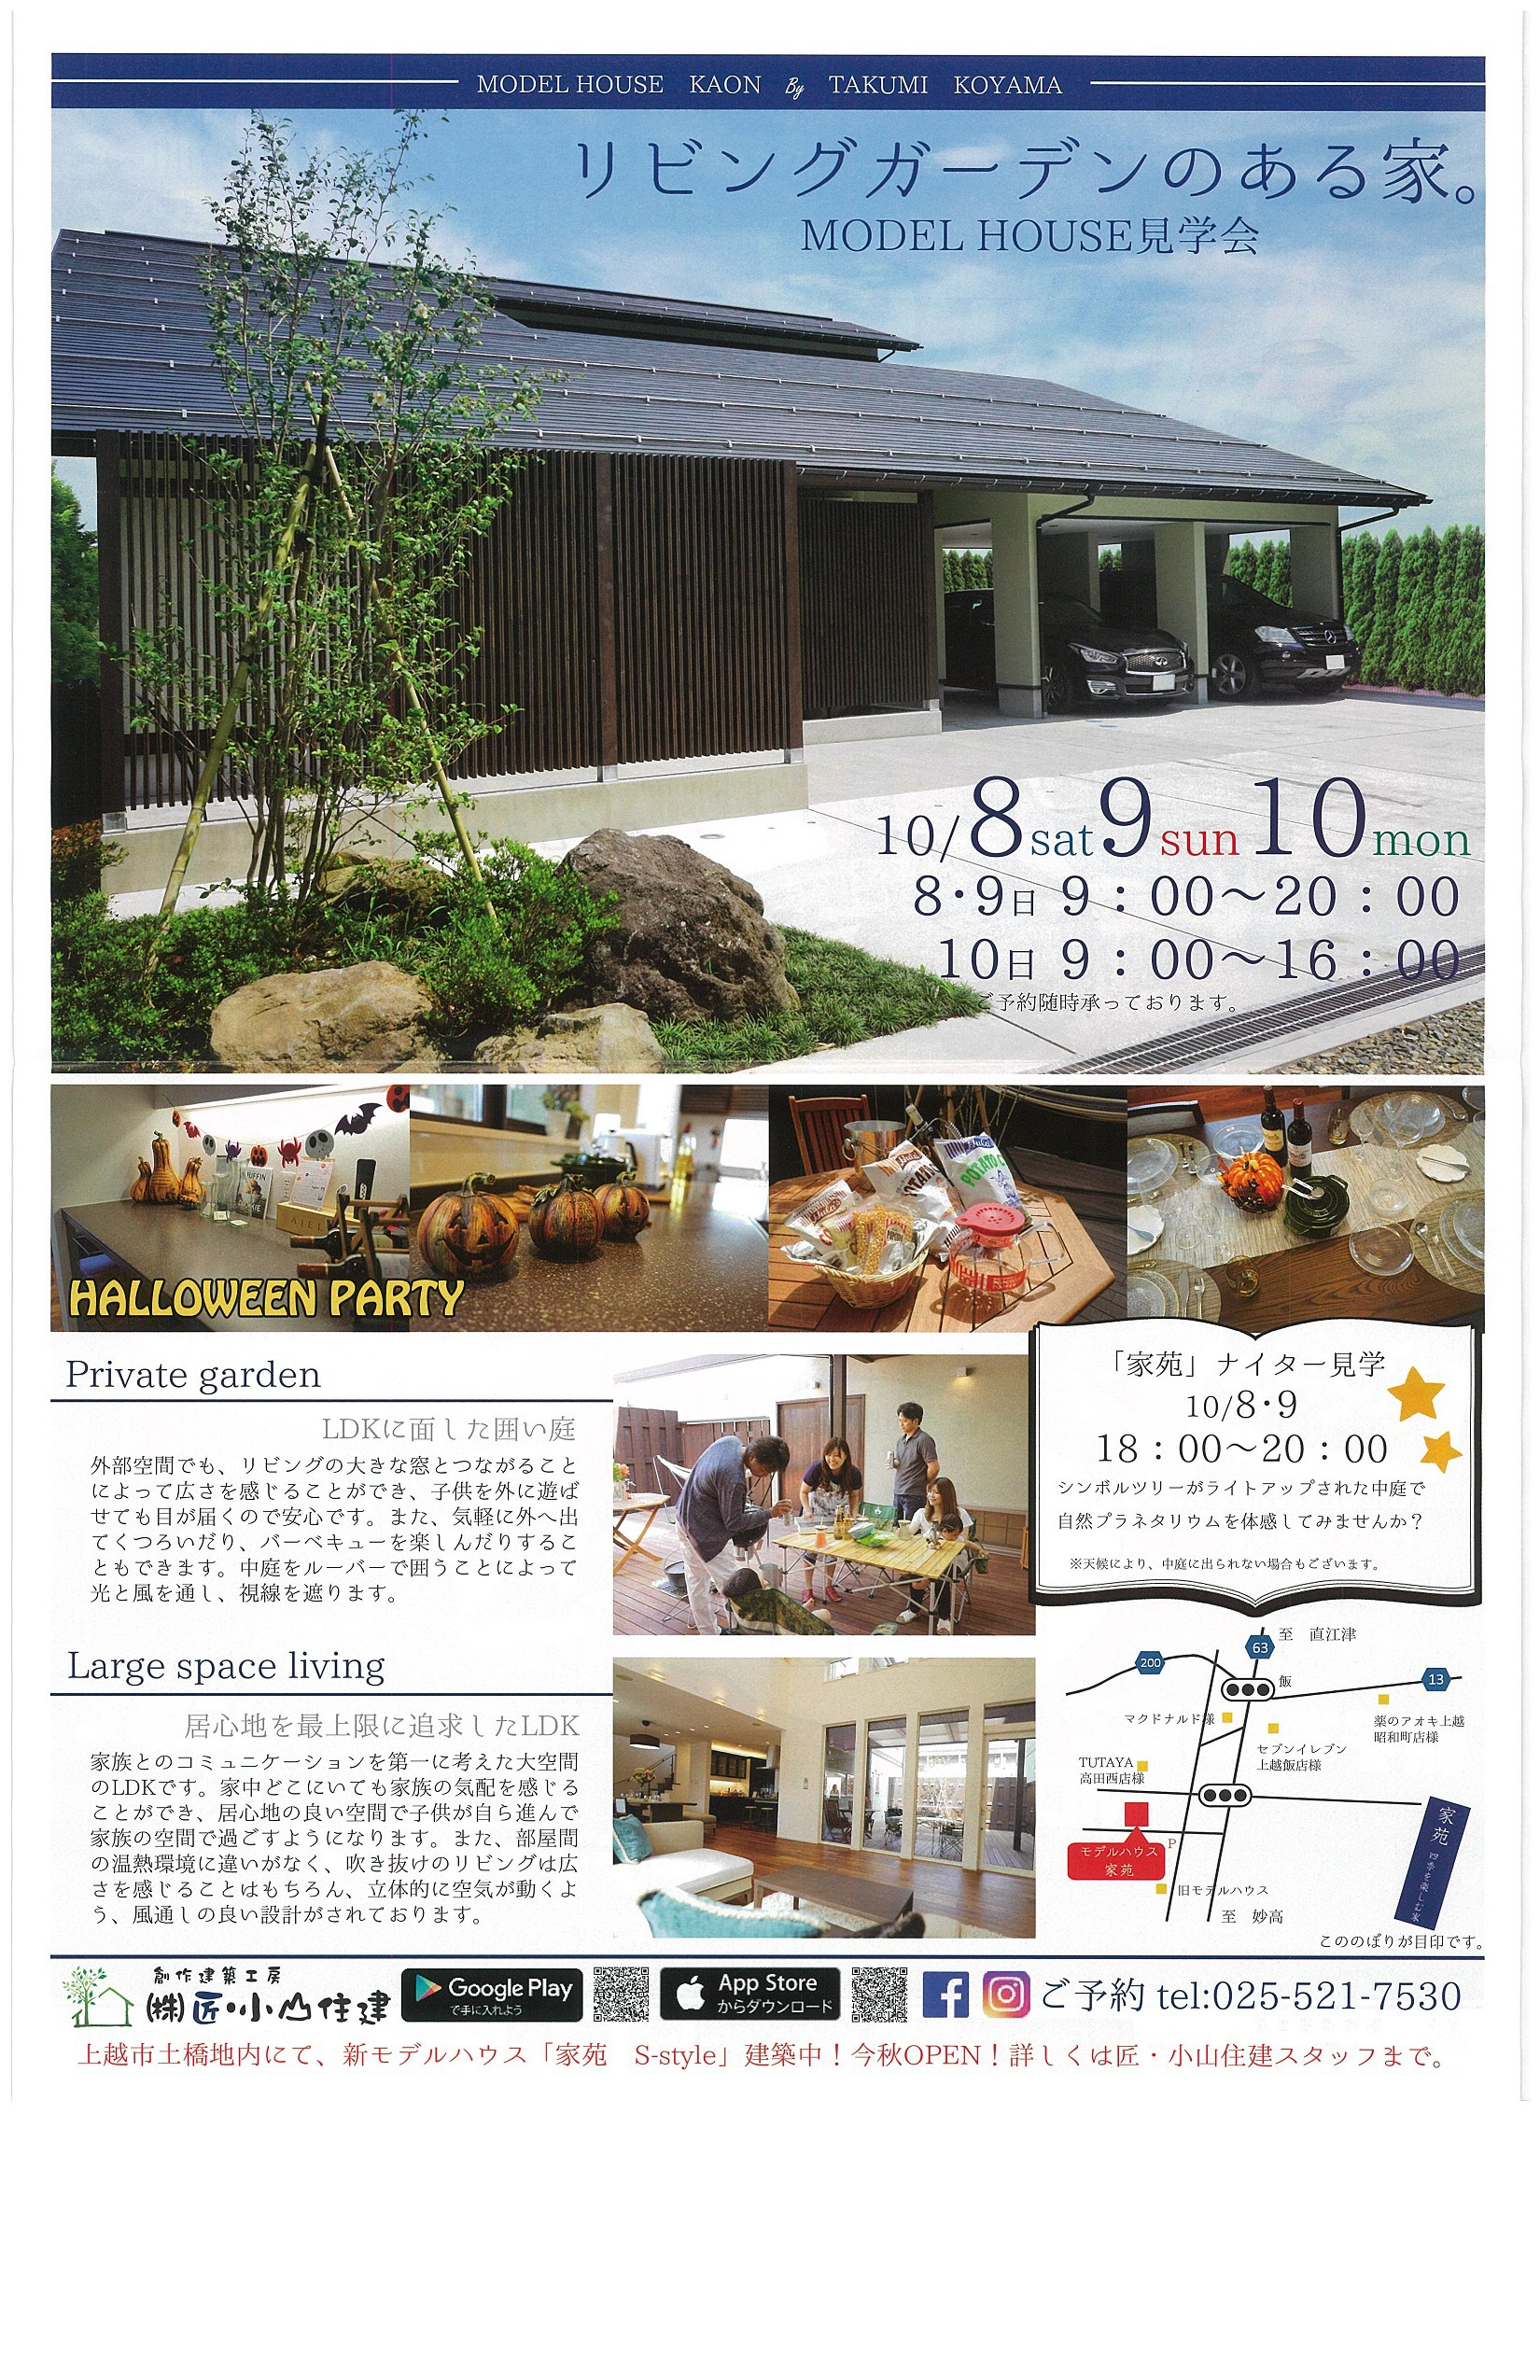 20161005160625-0001